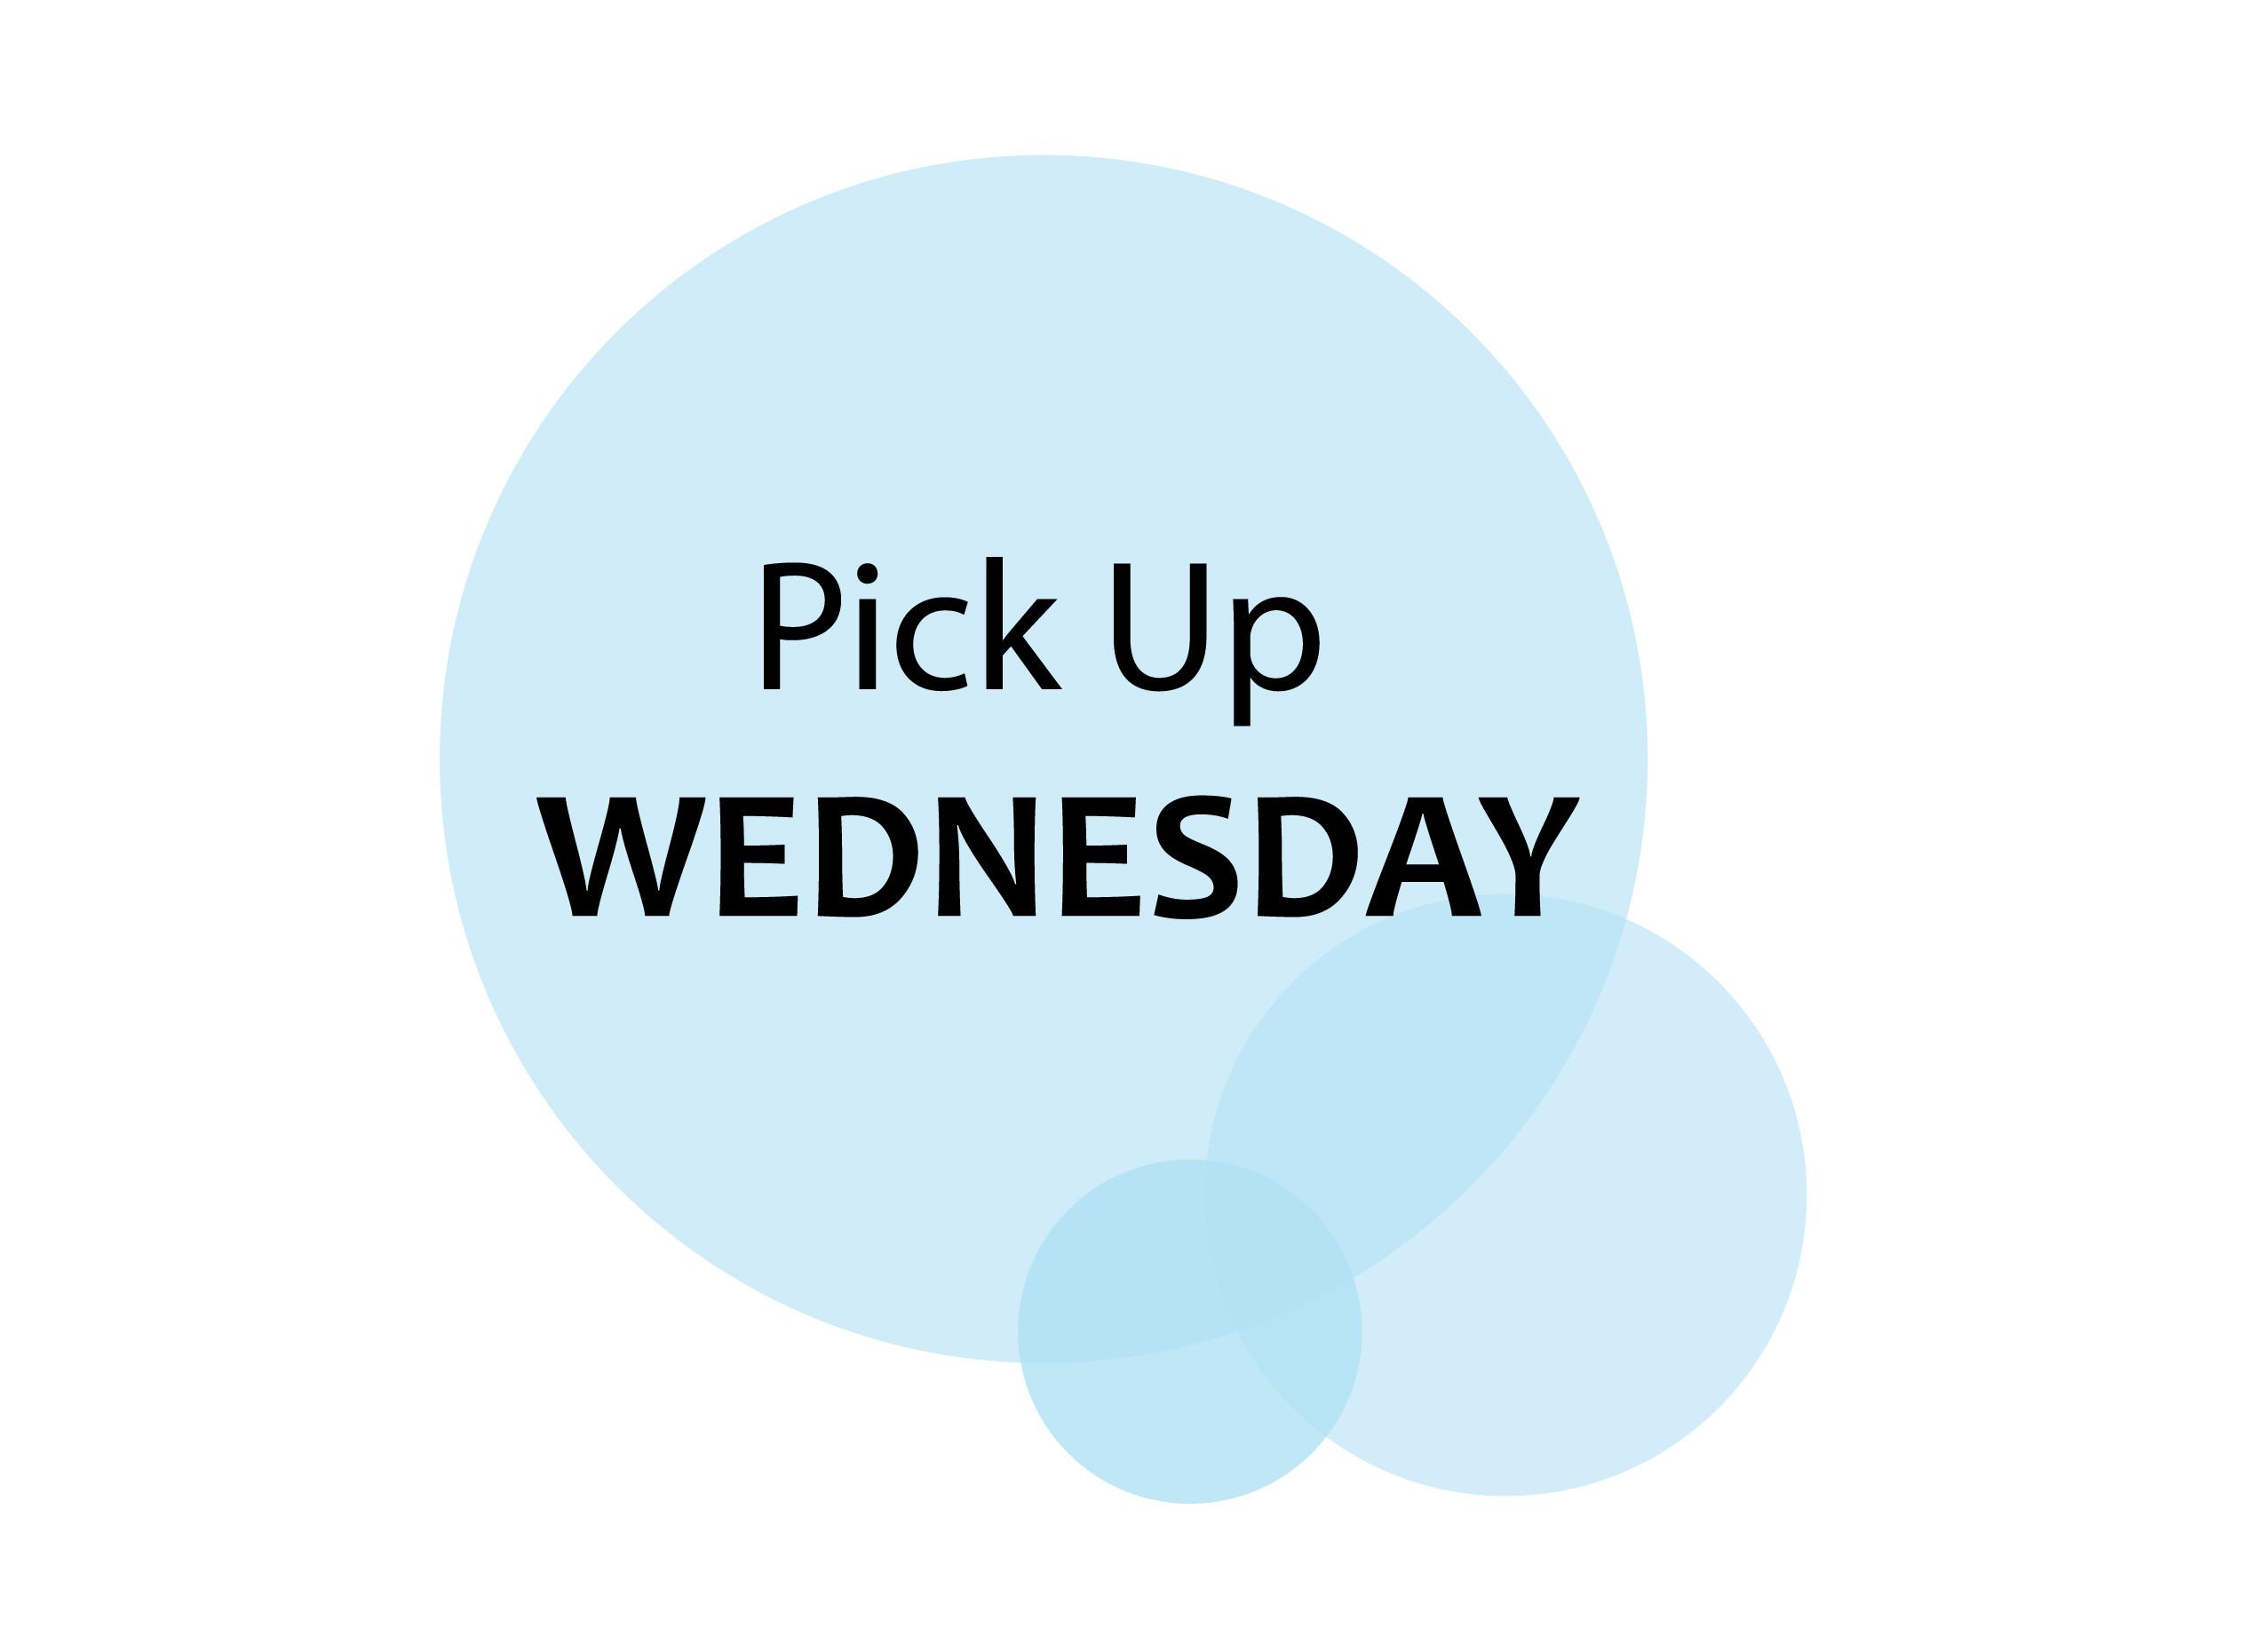 Pick Up Wednesday